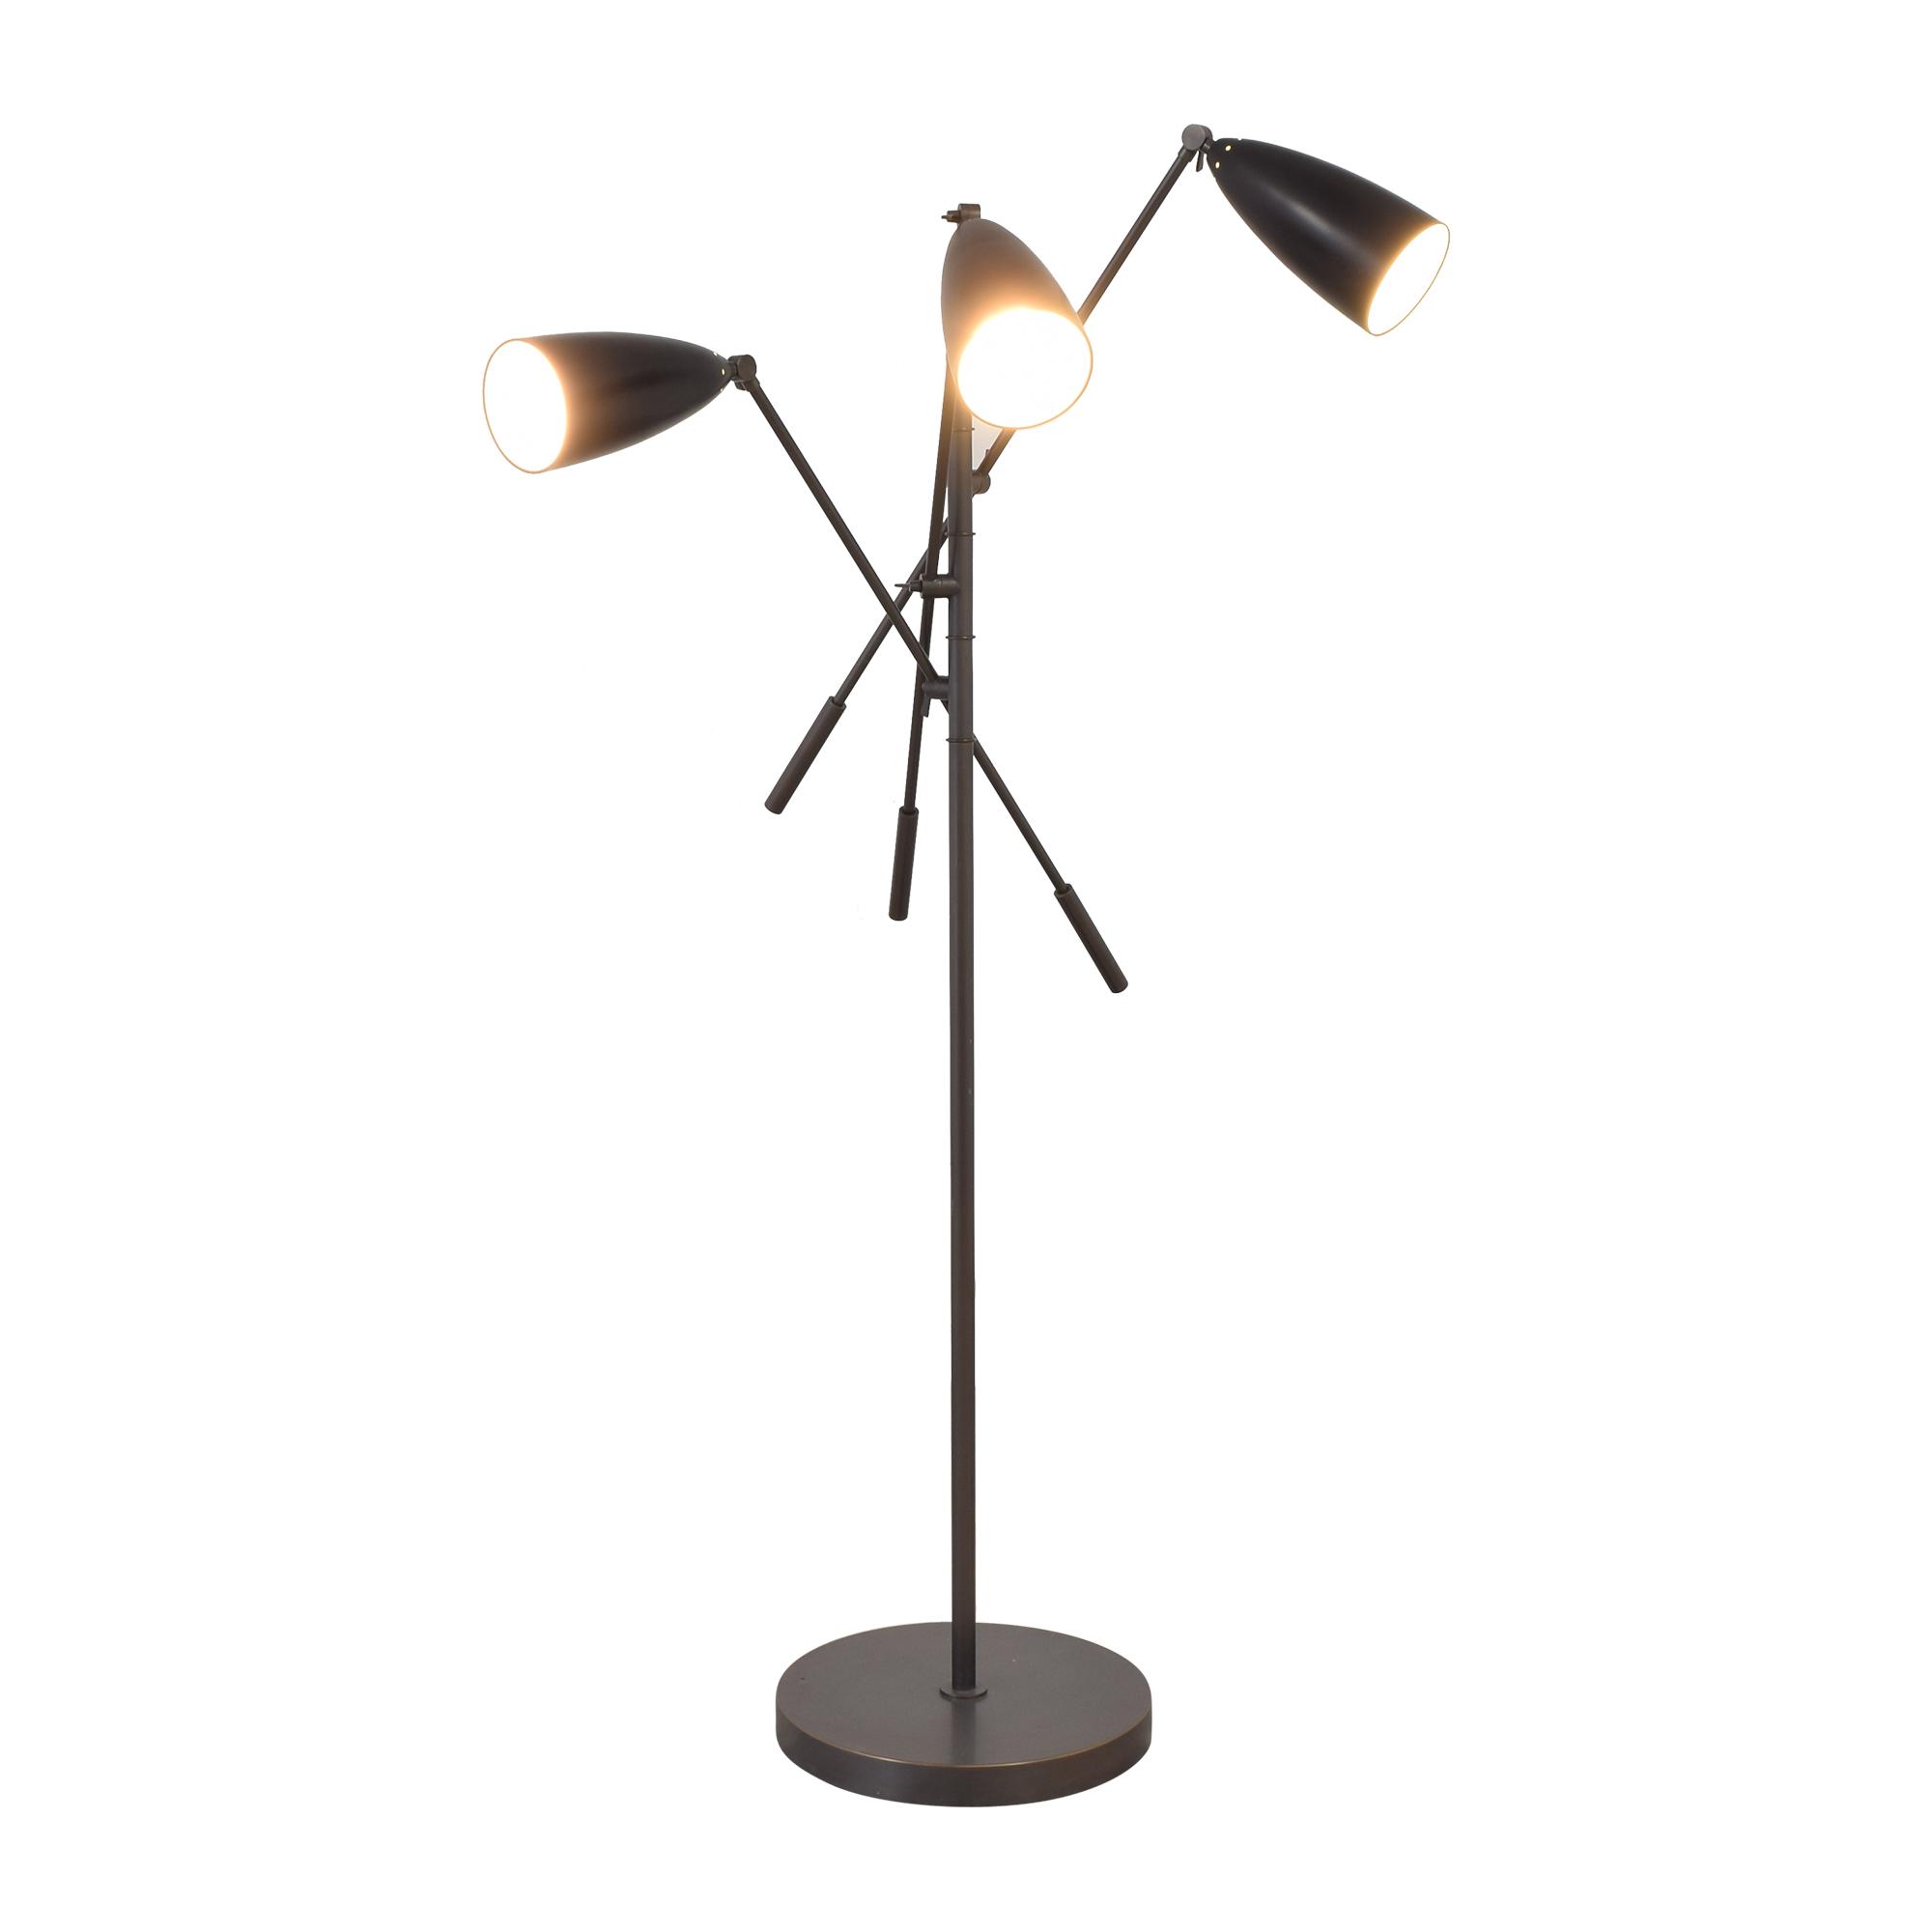 Organic Modernism Organic Modernism Trilight Floor Lamp price